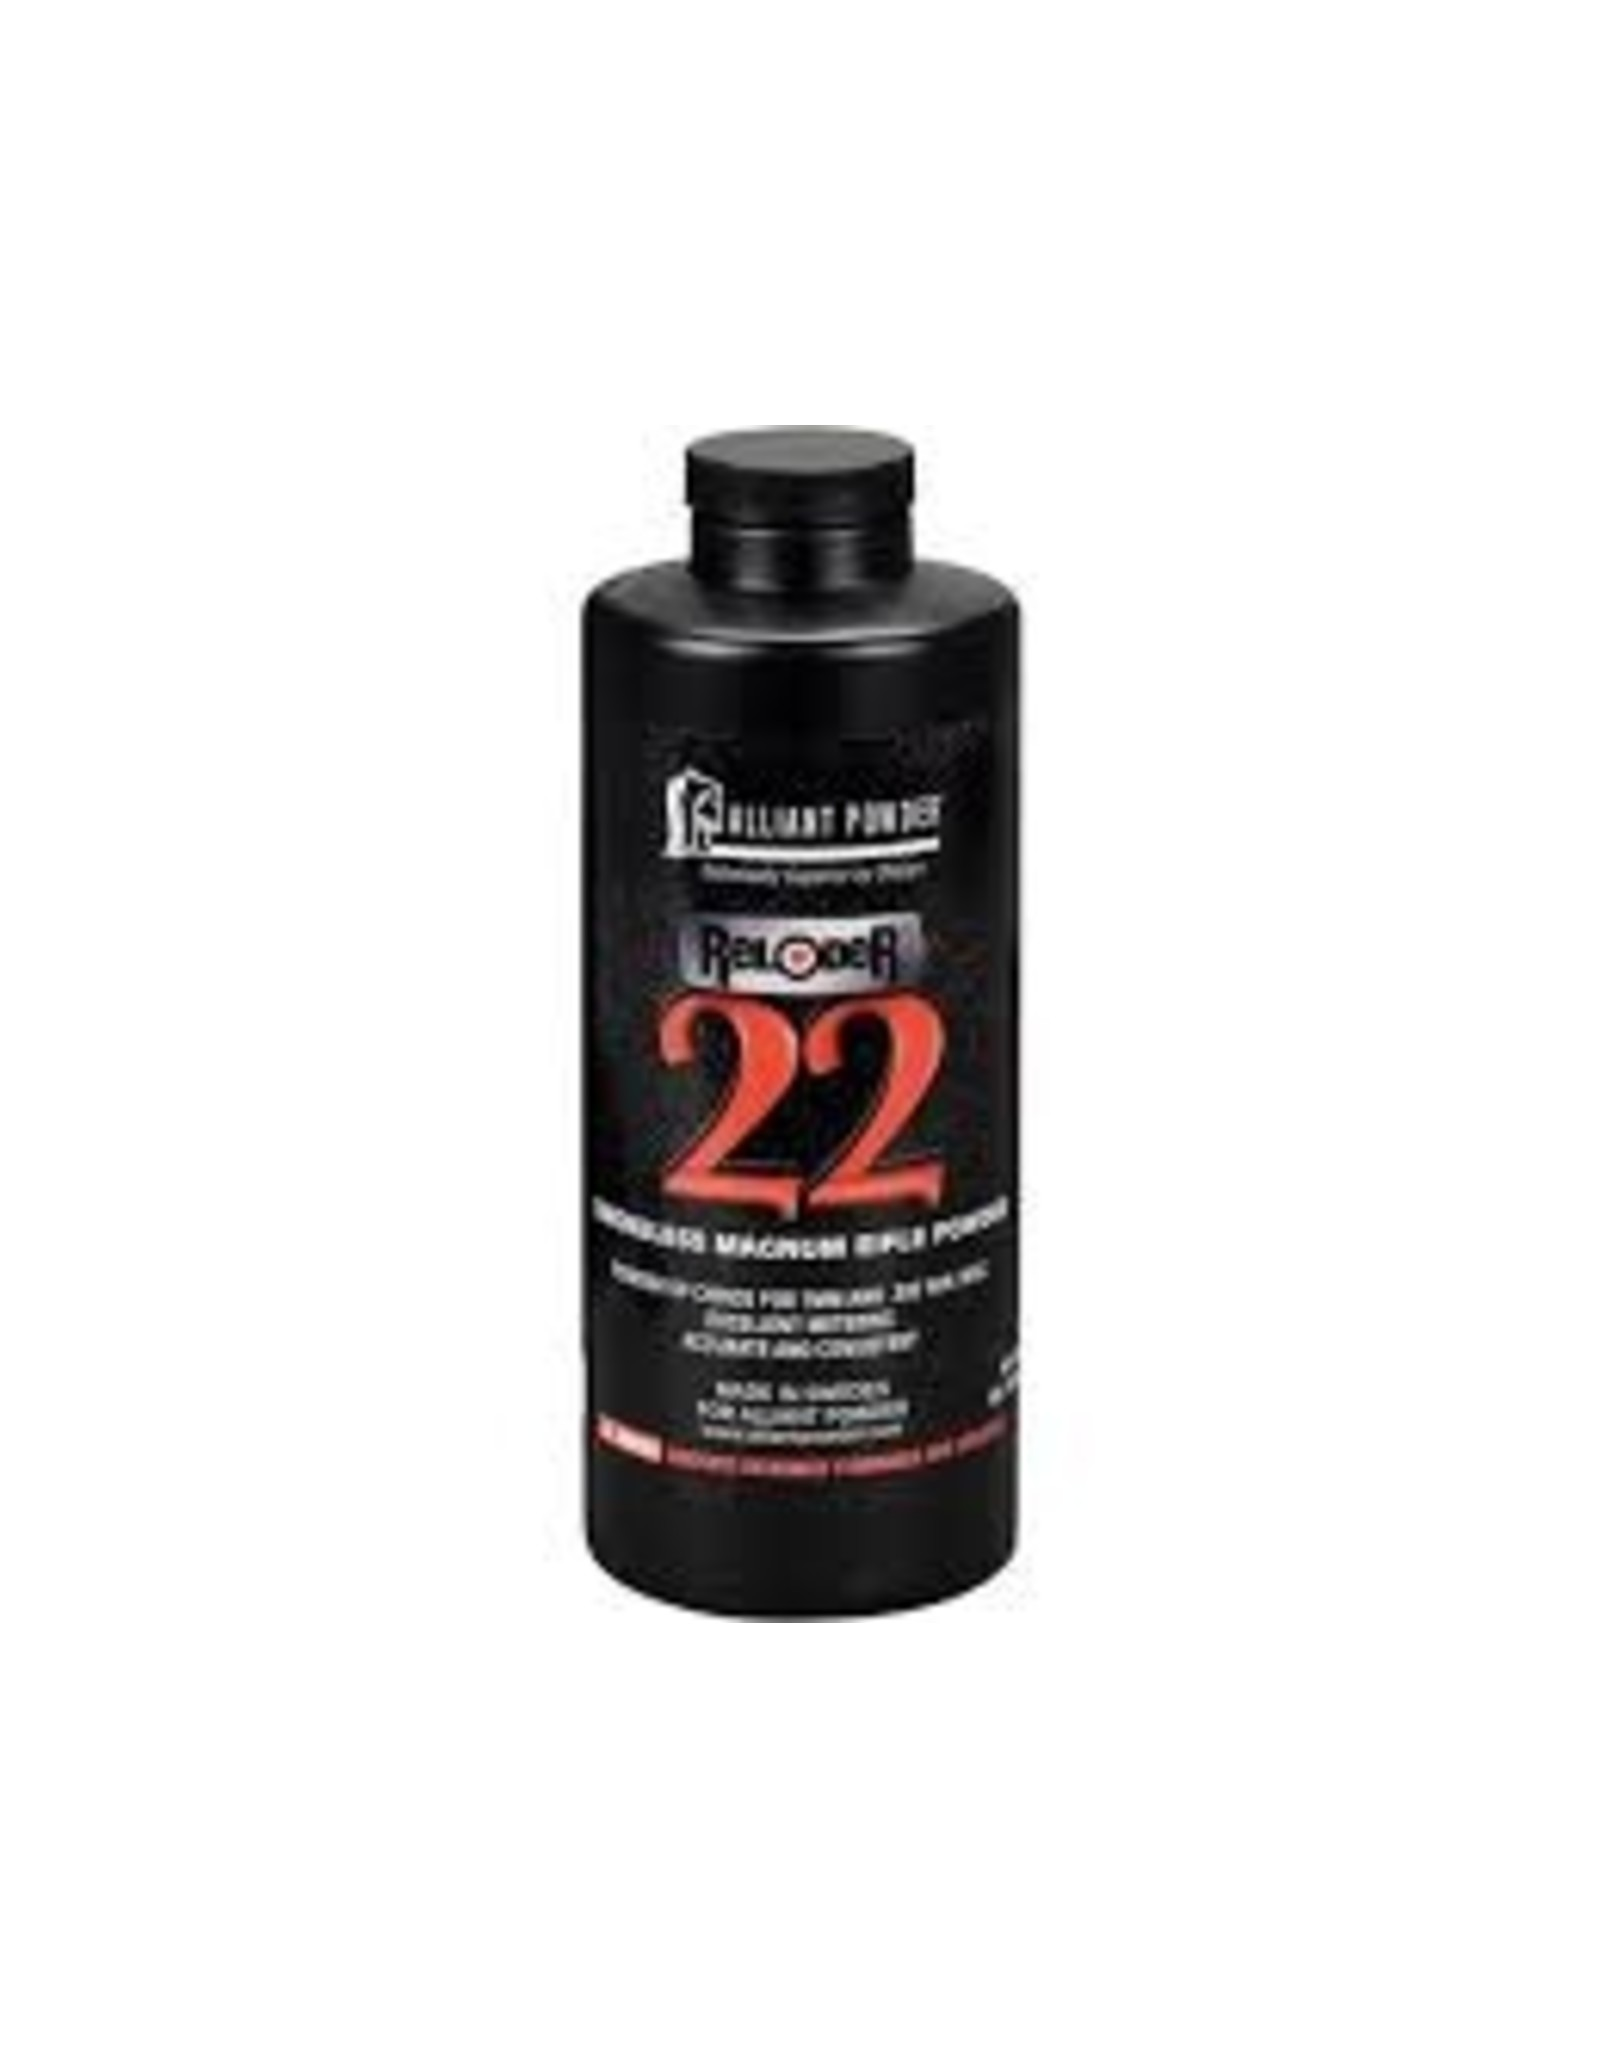 Alliant Powder Alliant Powder Reloader 22 Powder 1LB